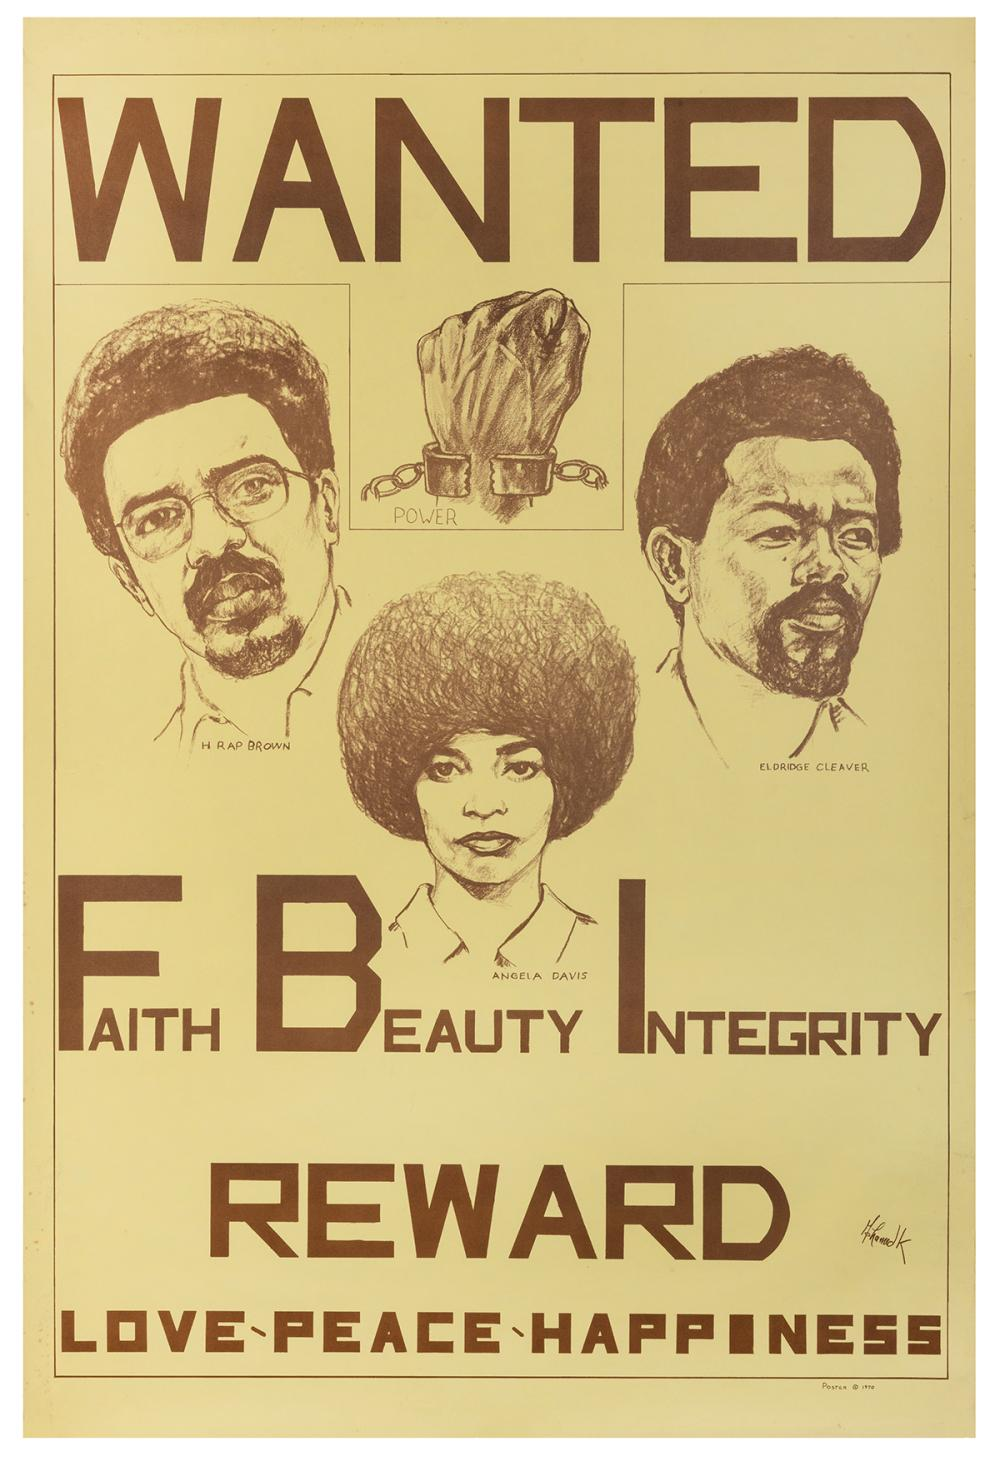 MOHAMED K. WANTED: FAITH BEAUTY INTEGRITY. REWARD: LOVE PEA...